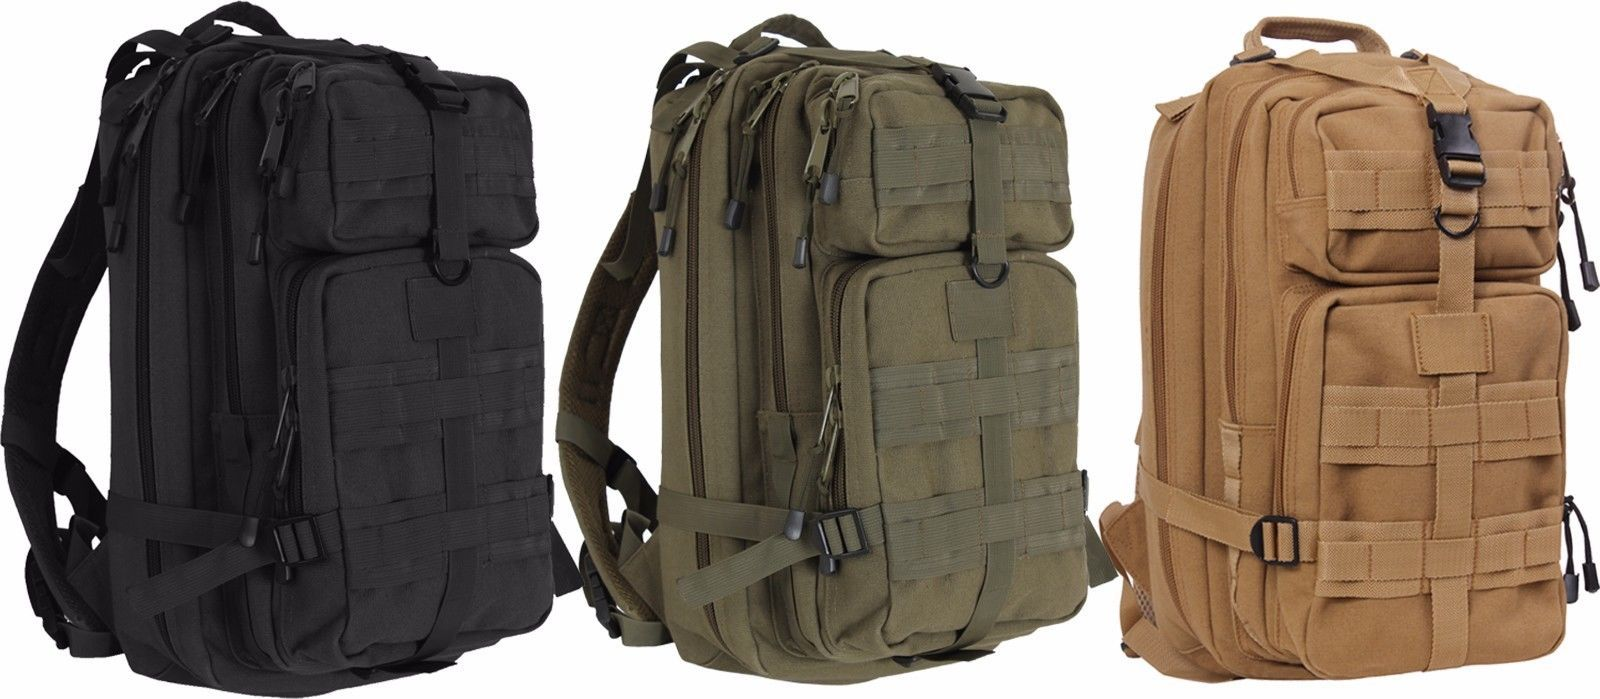 Canvas Medium Transport Backpack MOLLE and 49 similar items 1e413de54f4